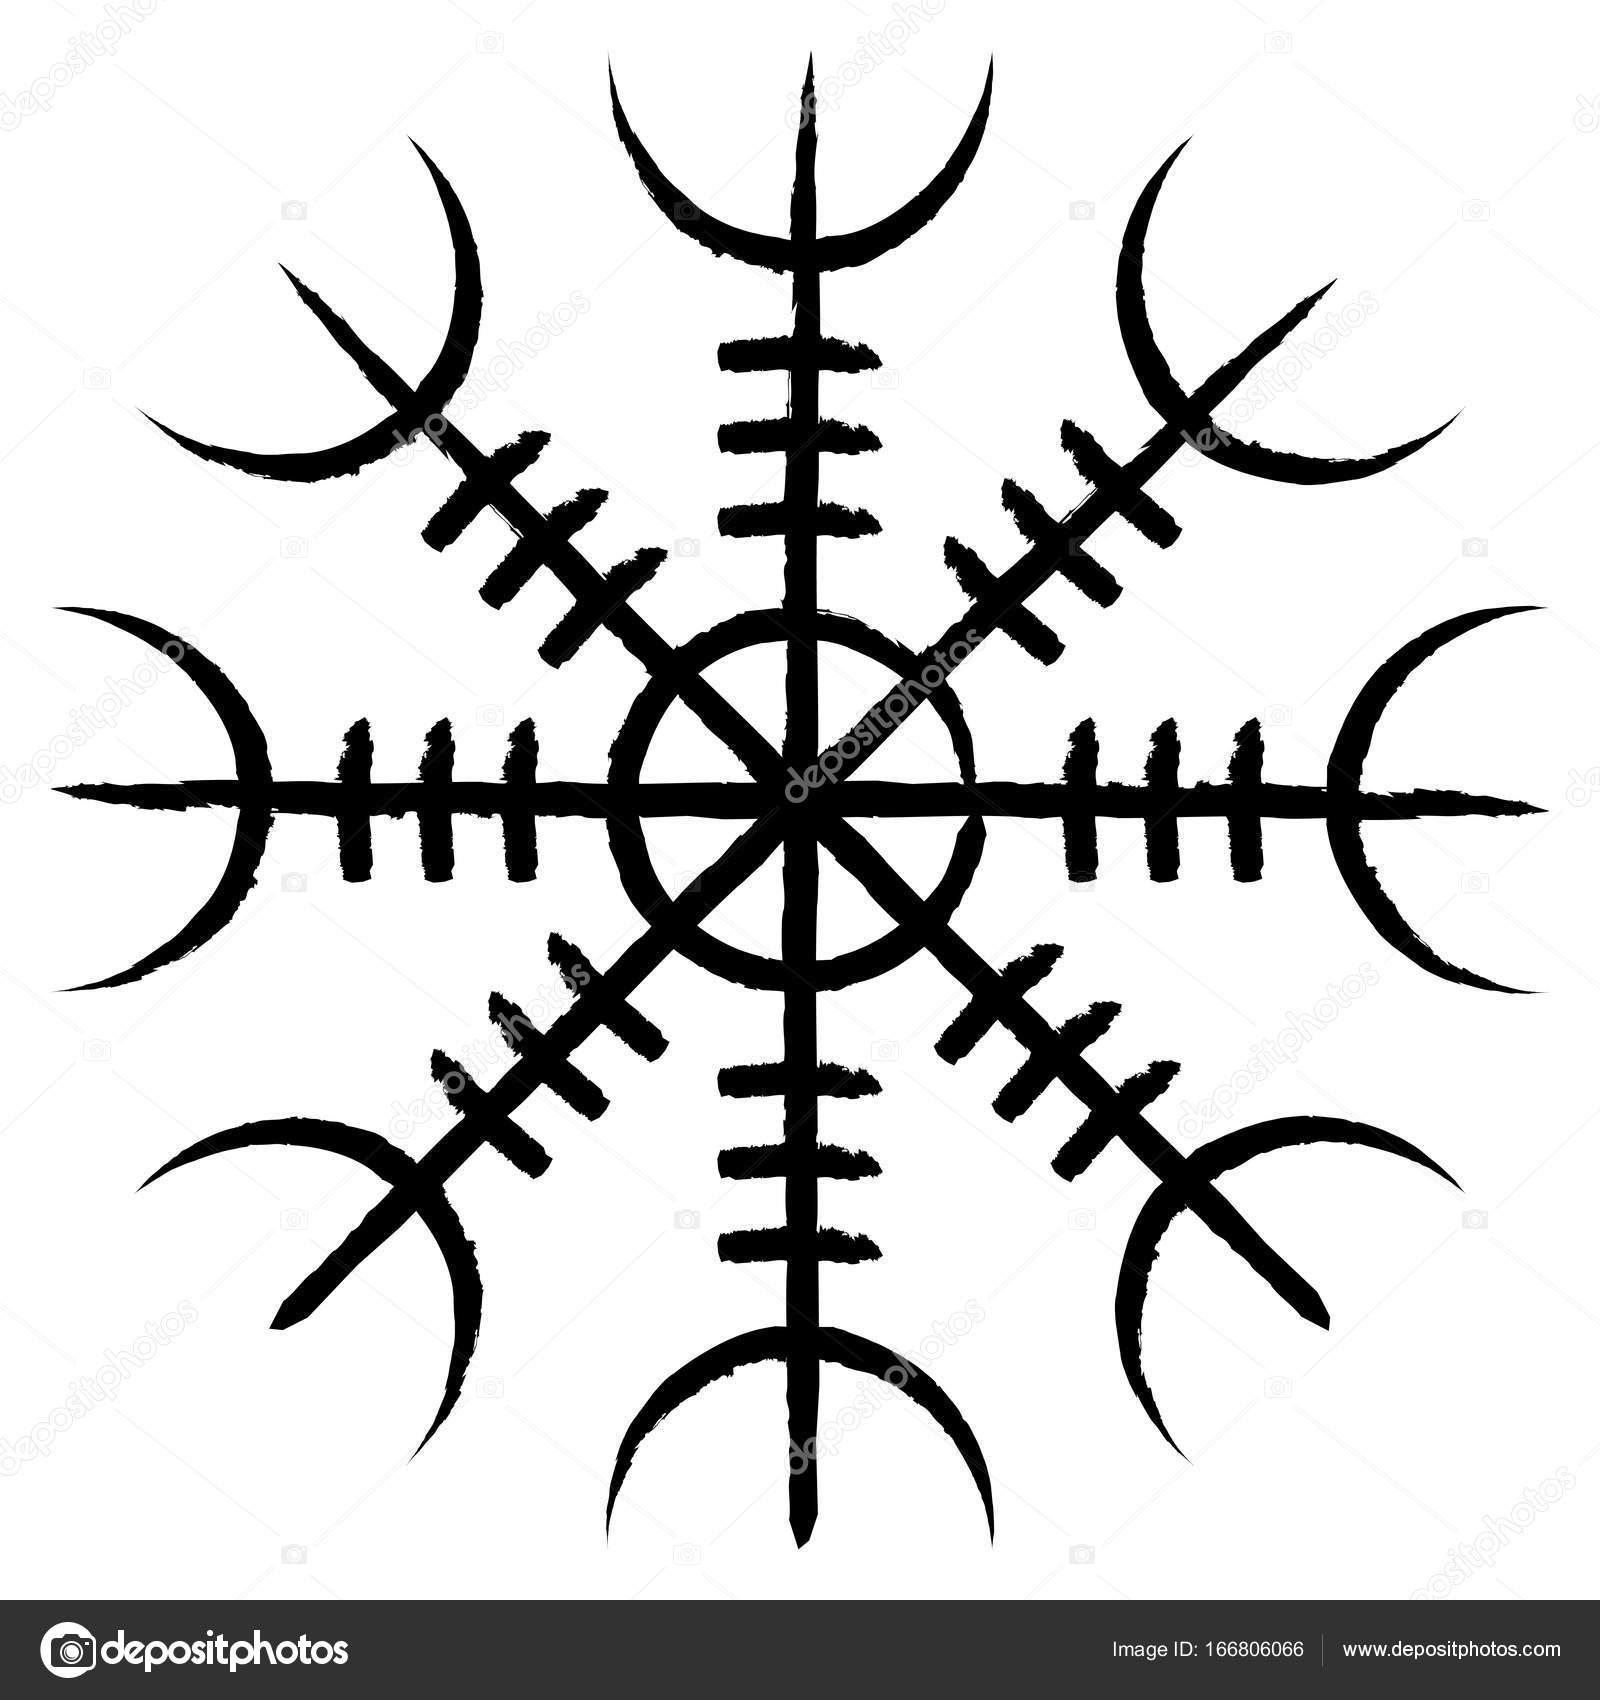 Simbolo De Dioses Nordicos Símbolo Pagano Aegishjalmur Vector De